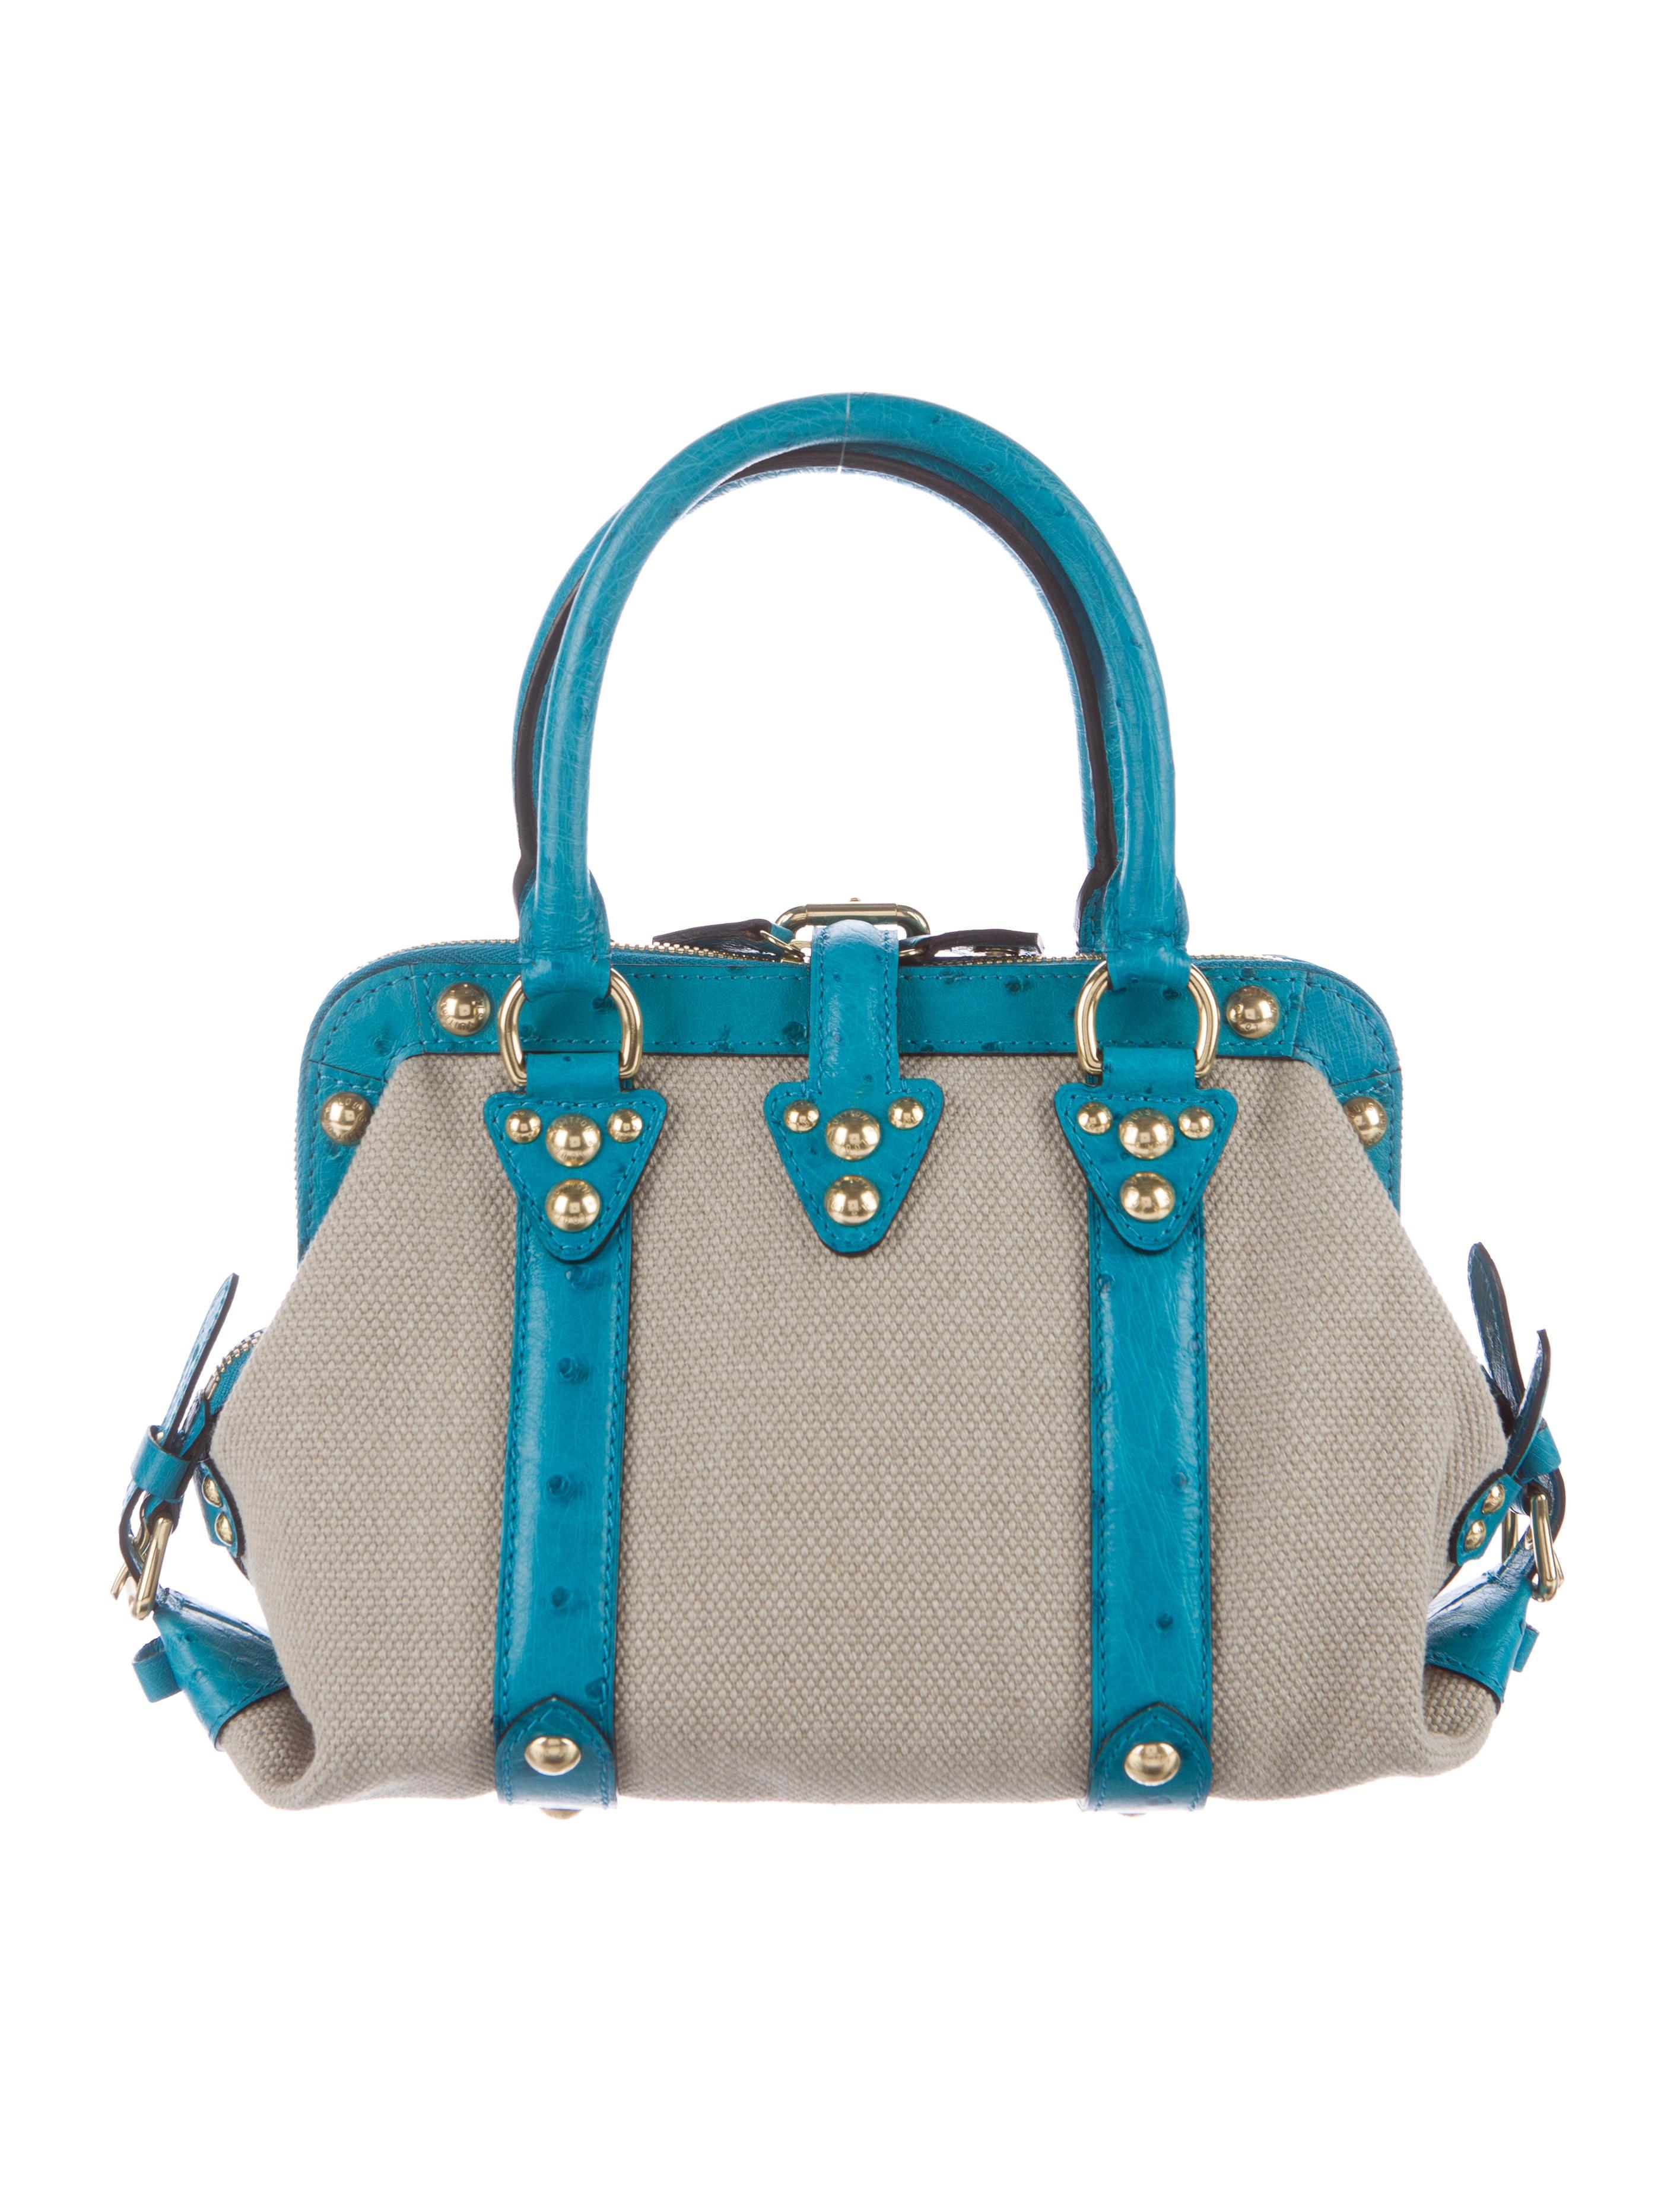 louis vuitton ostrich sac de nuit toile trianon mm handbags lou113276 the realreal. Black Bedroom Furniture Sets. Home Design Ideas